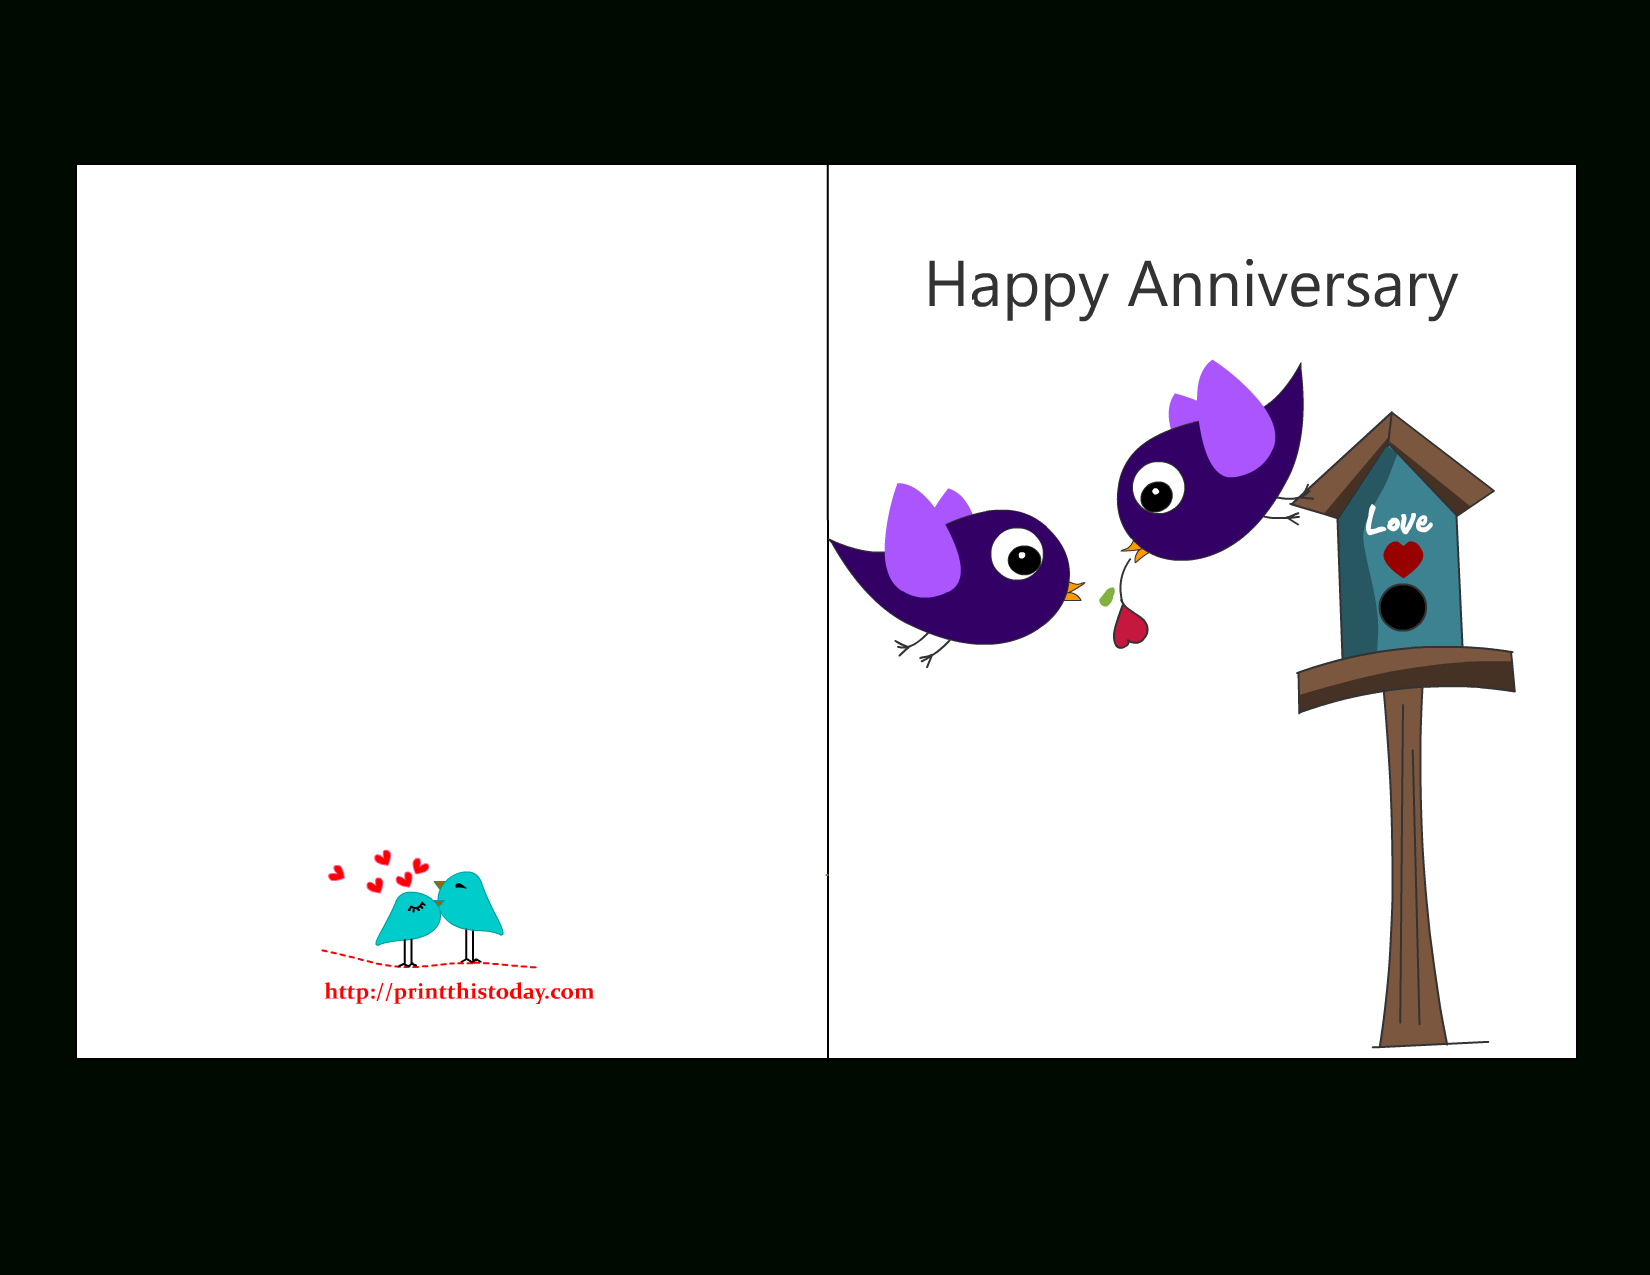 Free Anniversary Cards To Print | Free Printable Anniversary Cards - Printable Cards Free Anniversary